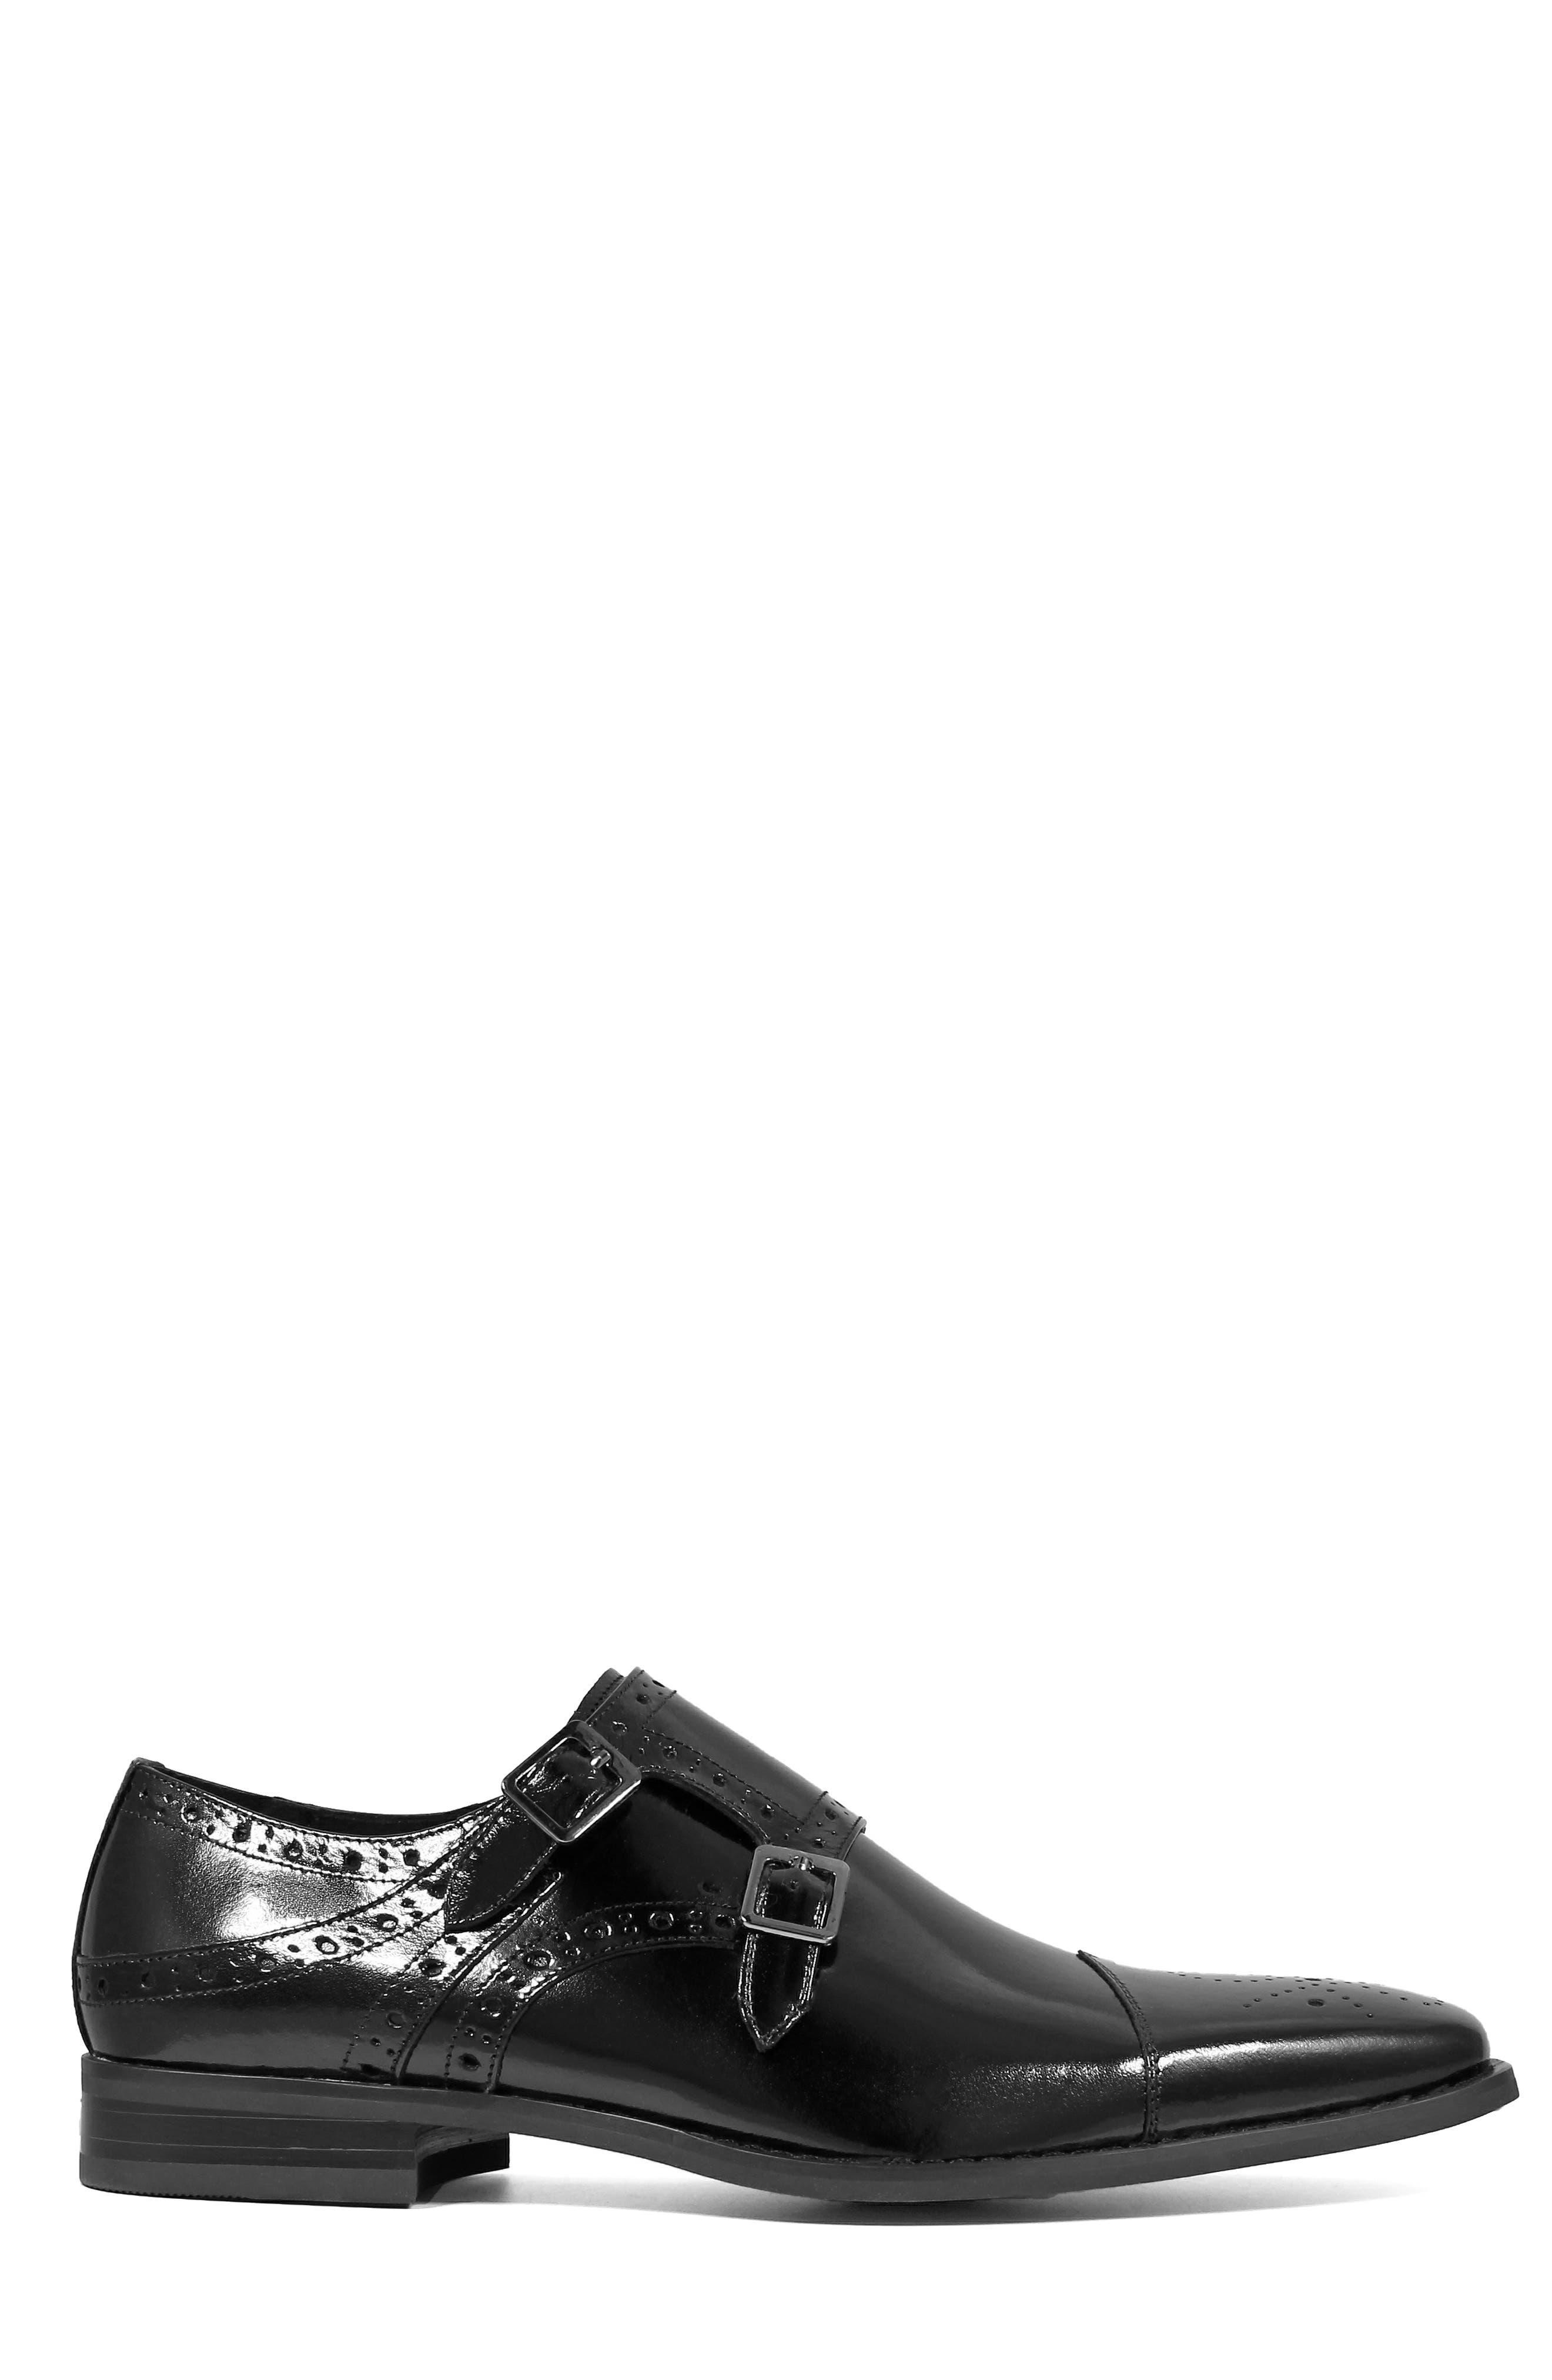 Tayton Cap Toe Double Strap Monk Shoe,                             Alternate thumbnail 3, color,                             001